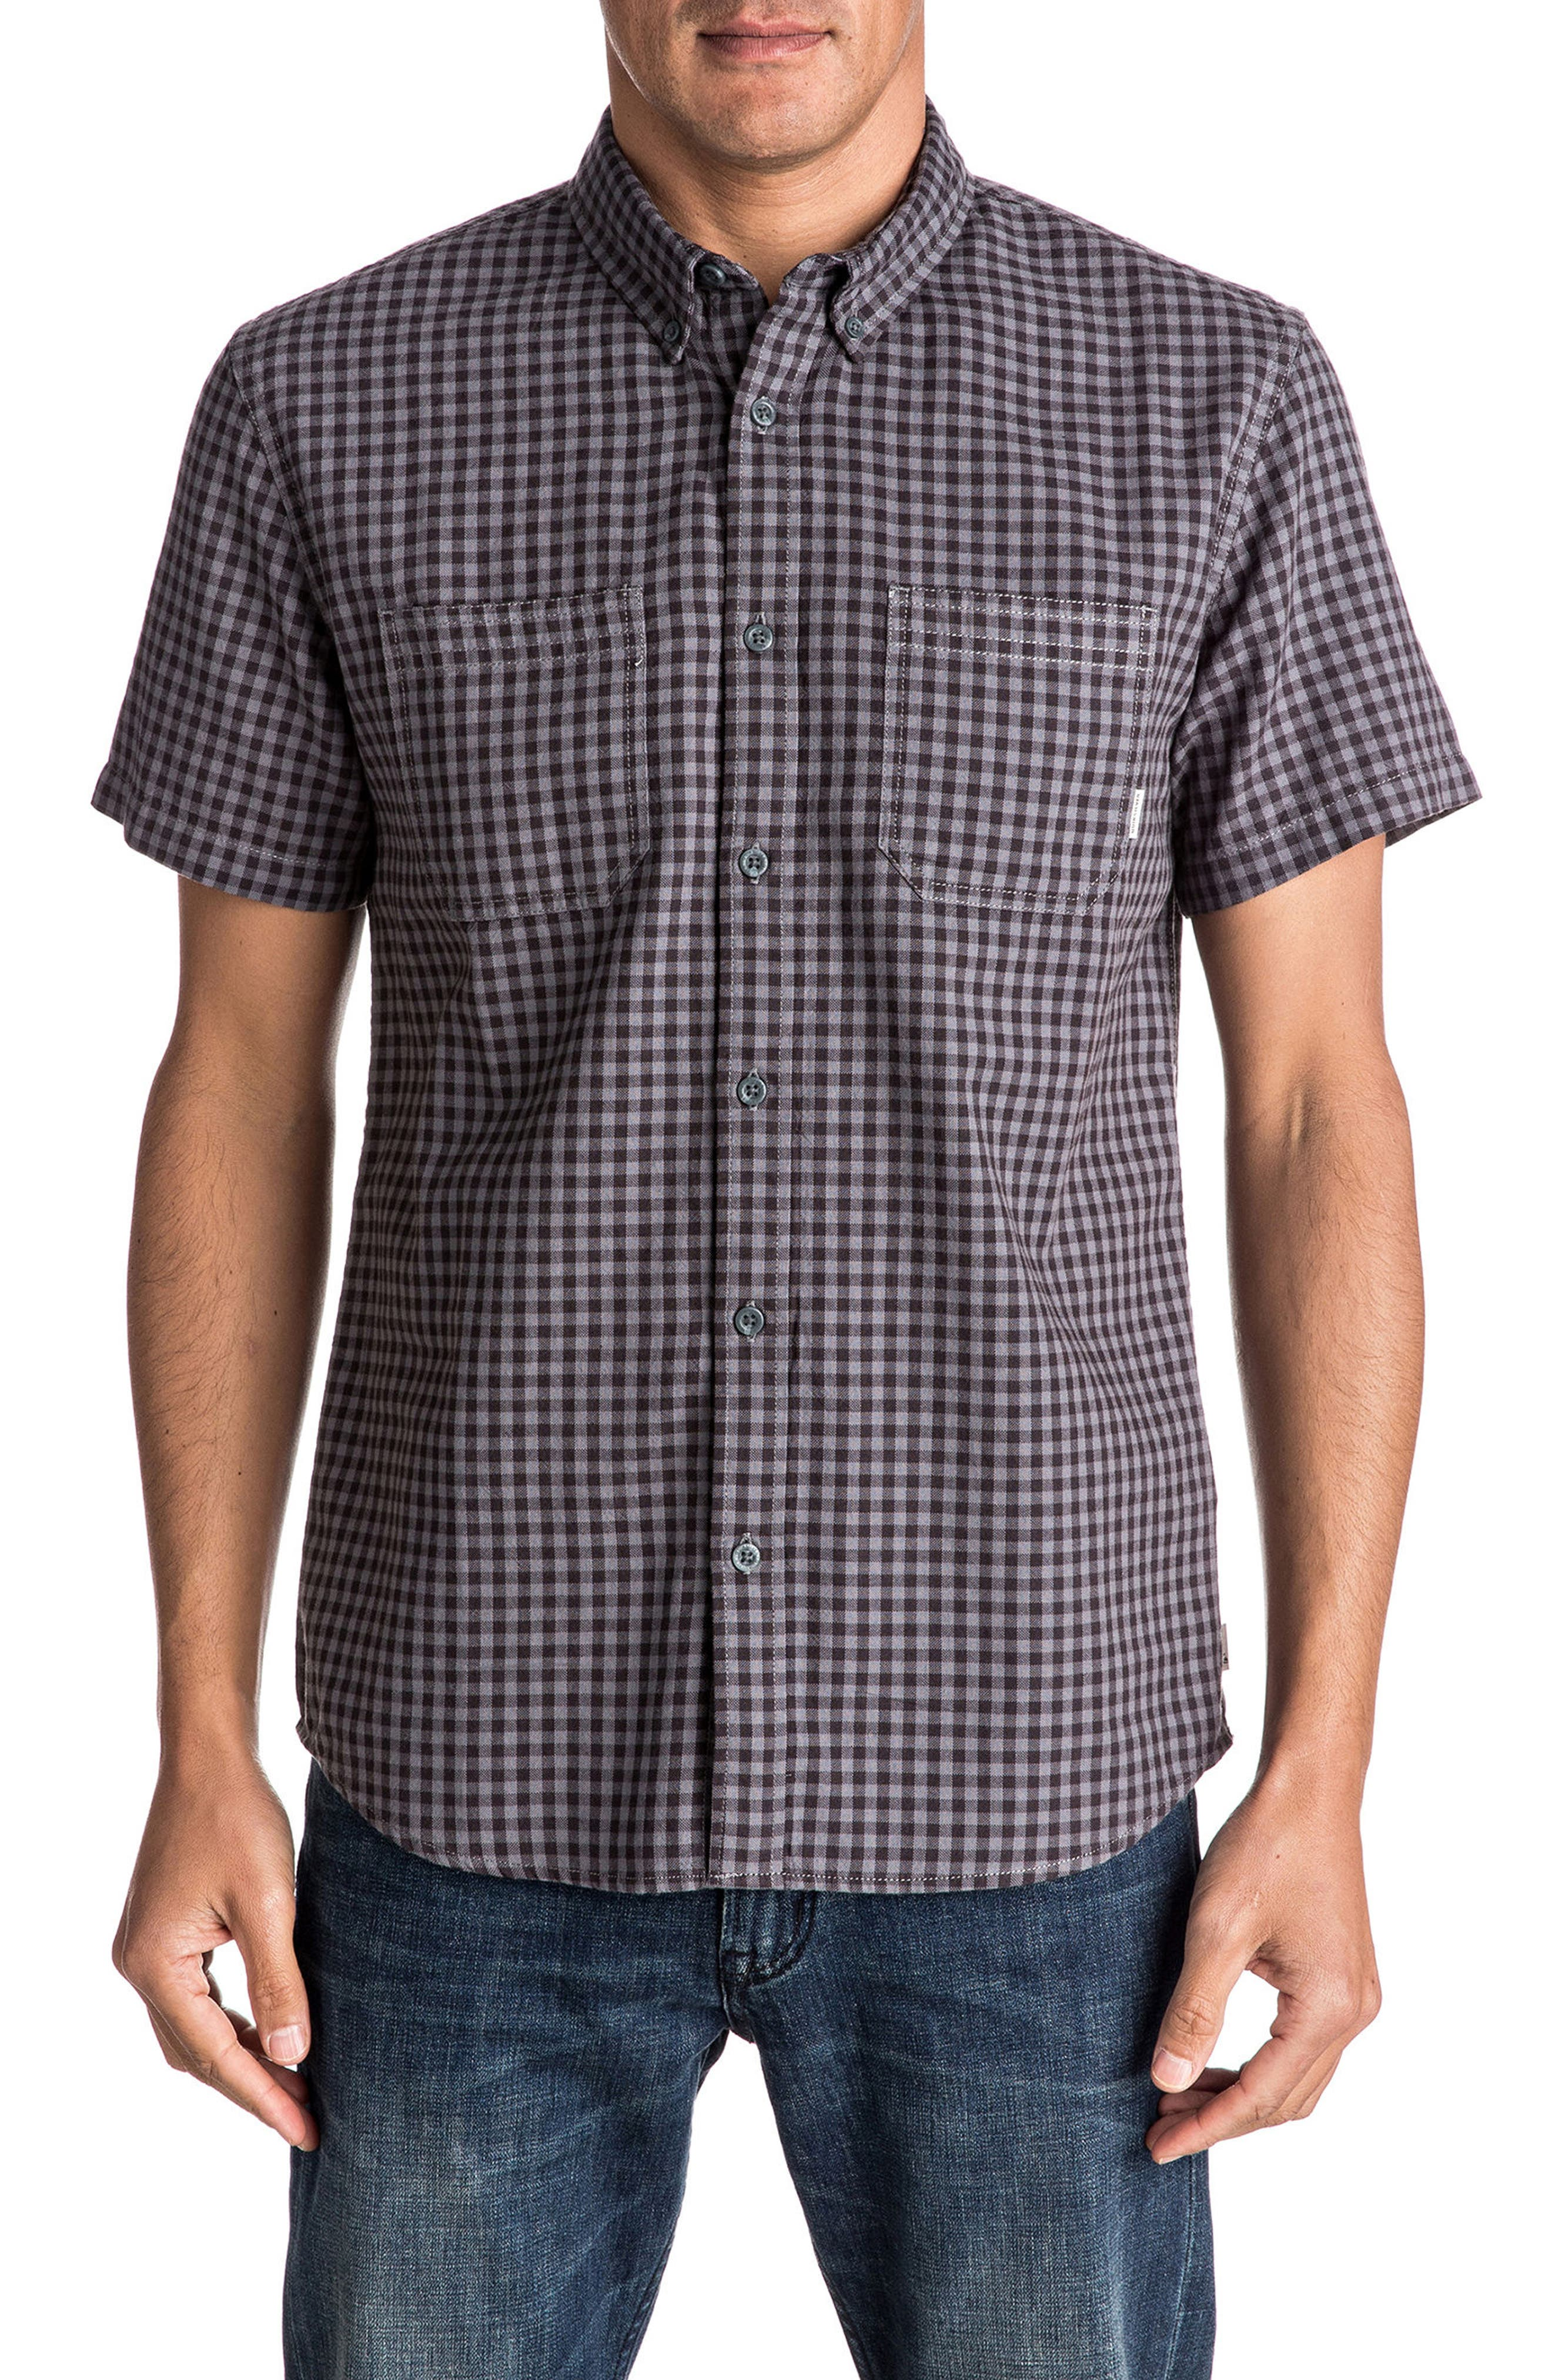 Quiksilver Forte Night Check Shirt